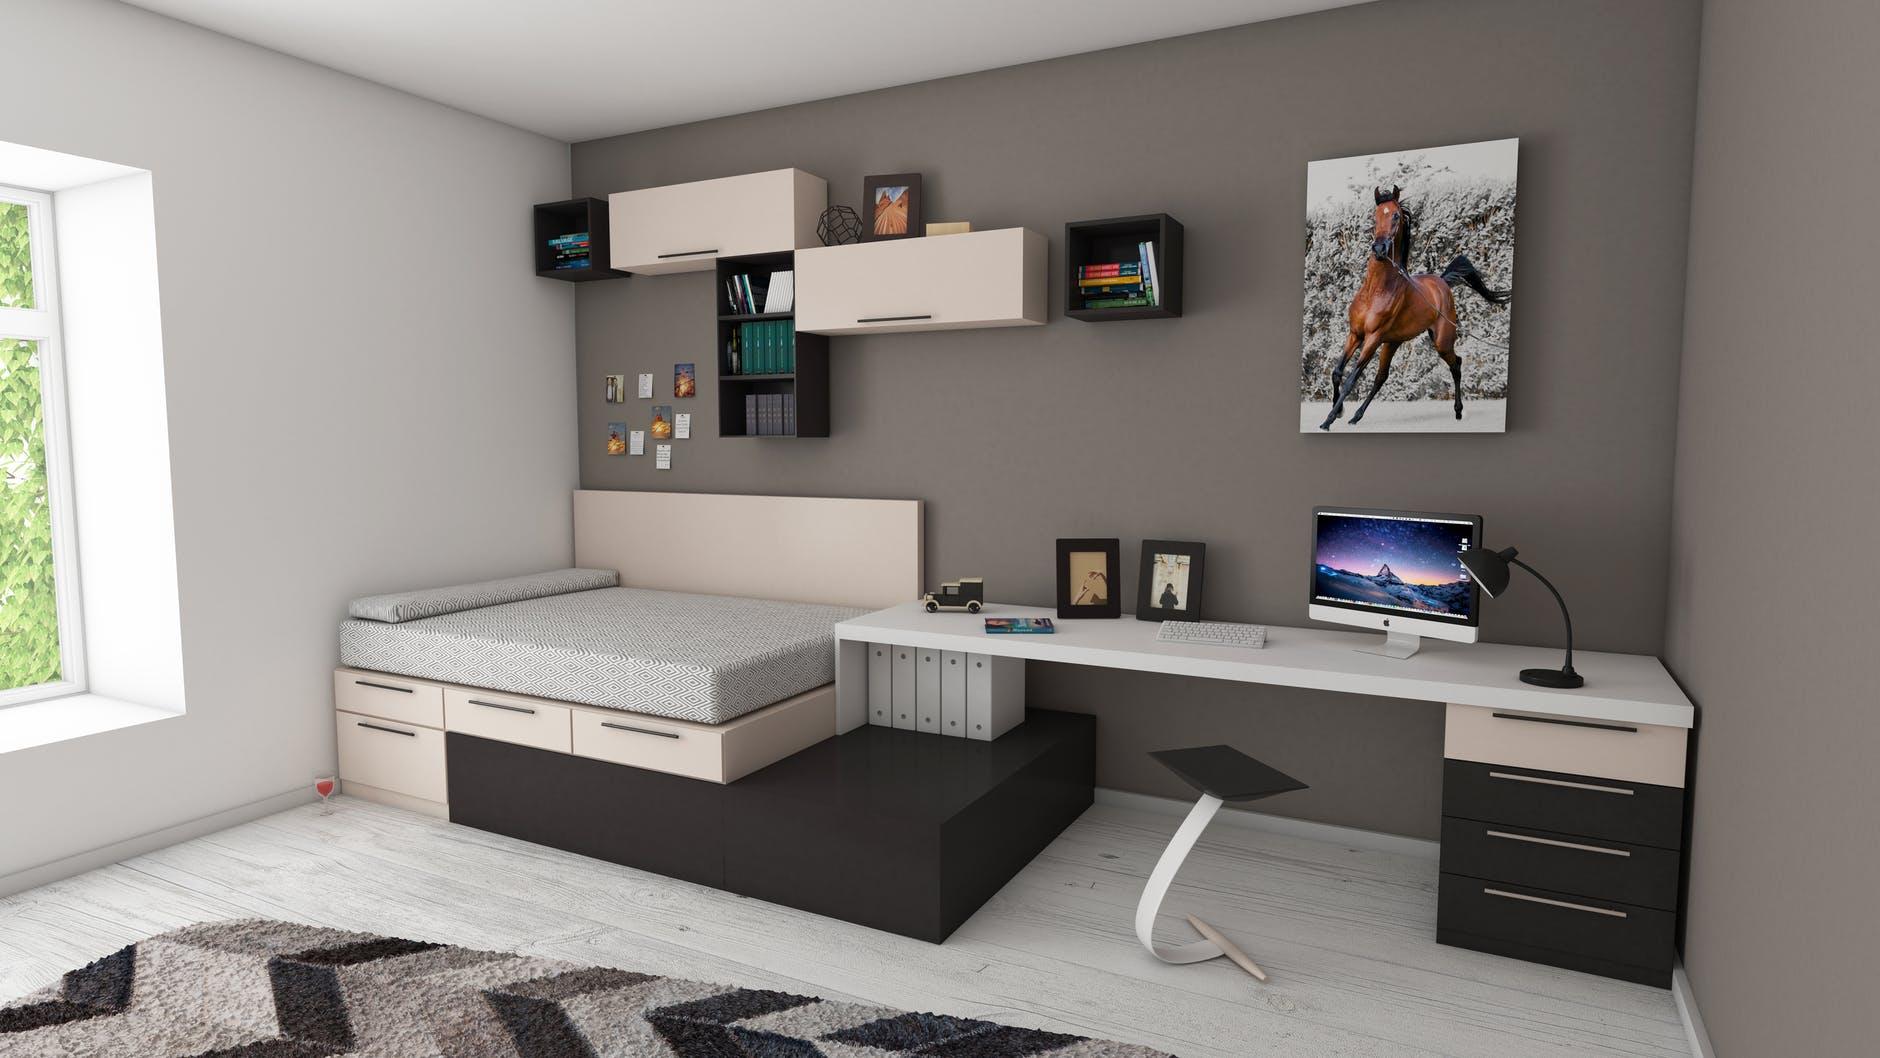 Desain Apartemen 2 Kamar - Furnitur Serbaguna